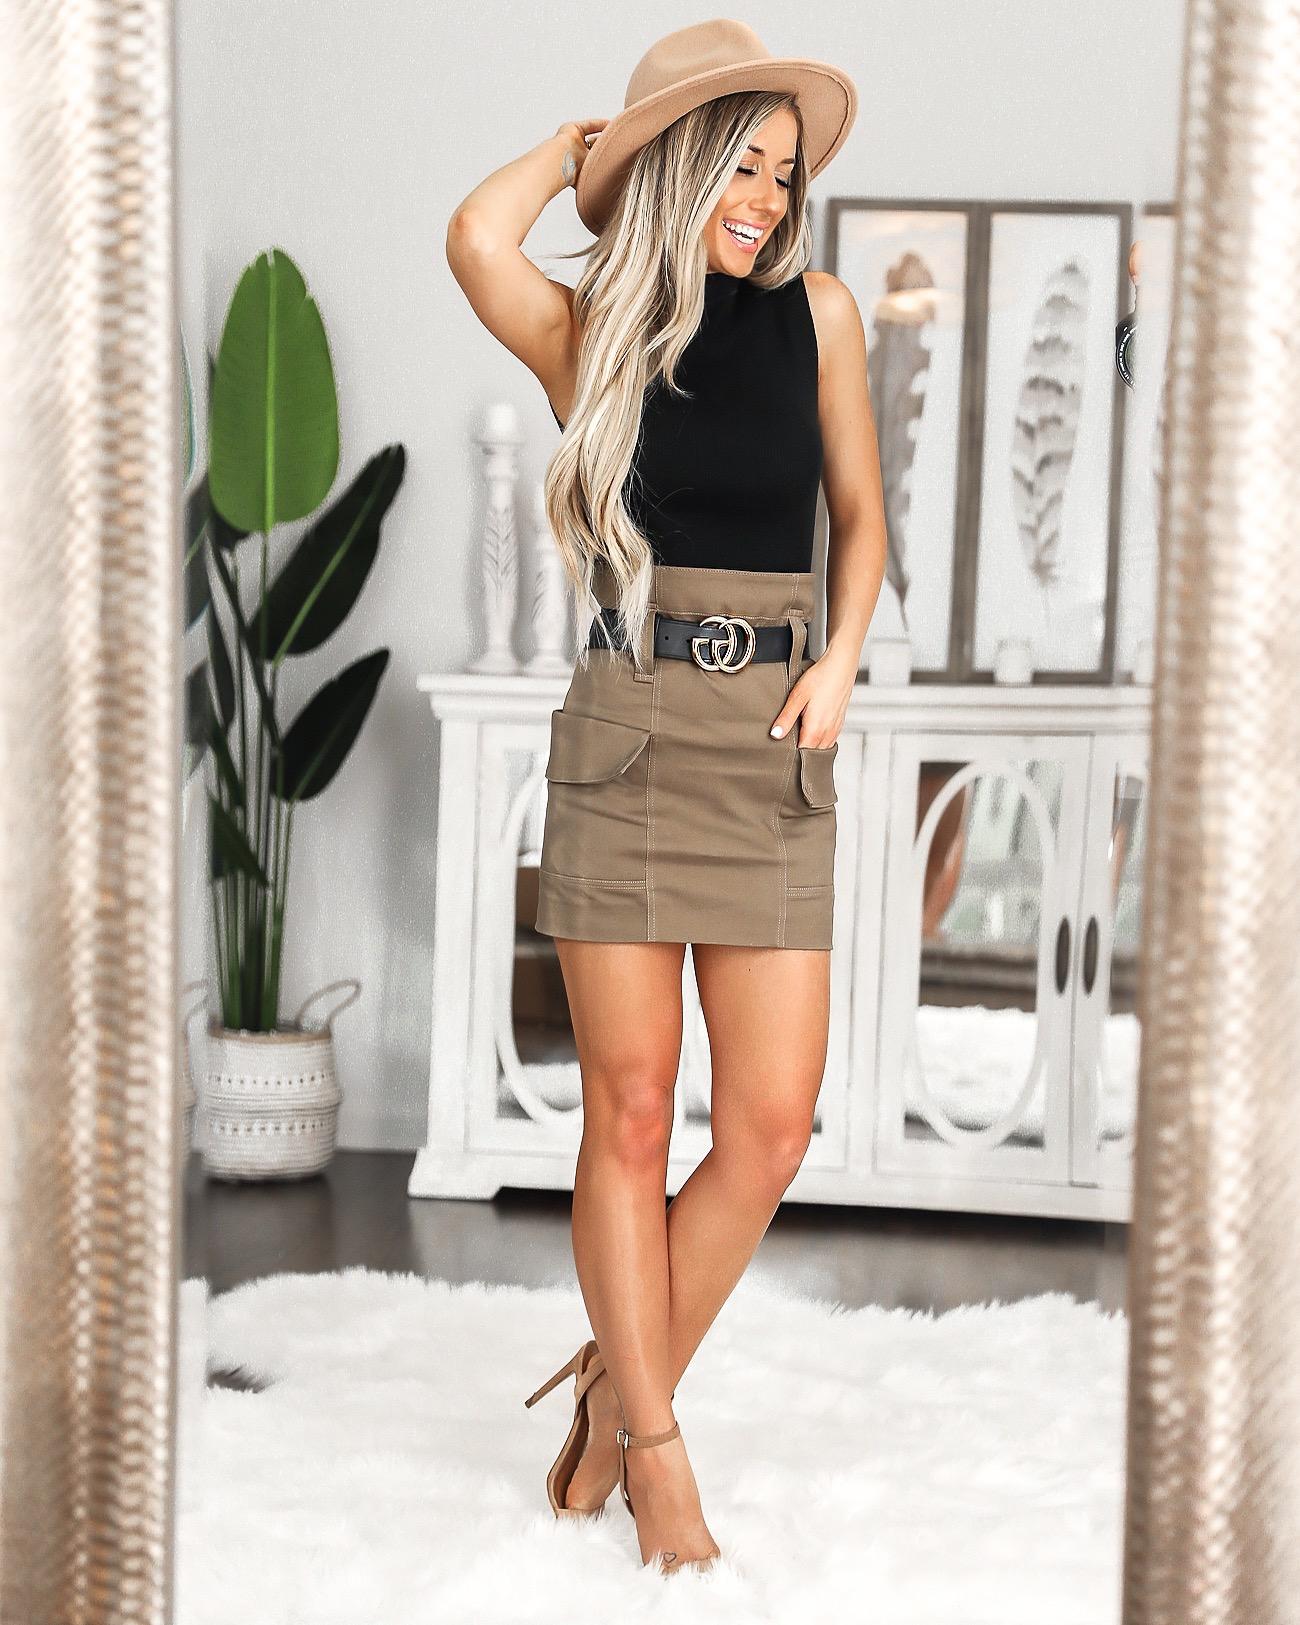 J.ing Date Night outfit Black Gucci Belt Cargo skirt Tan fedora hat Laura Beverlin